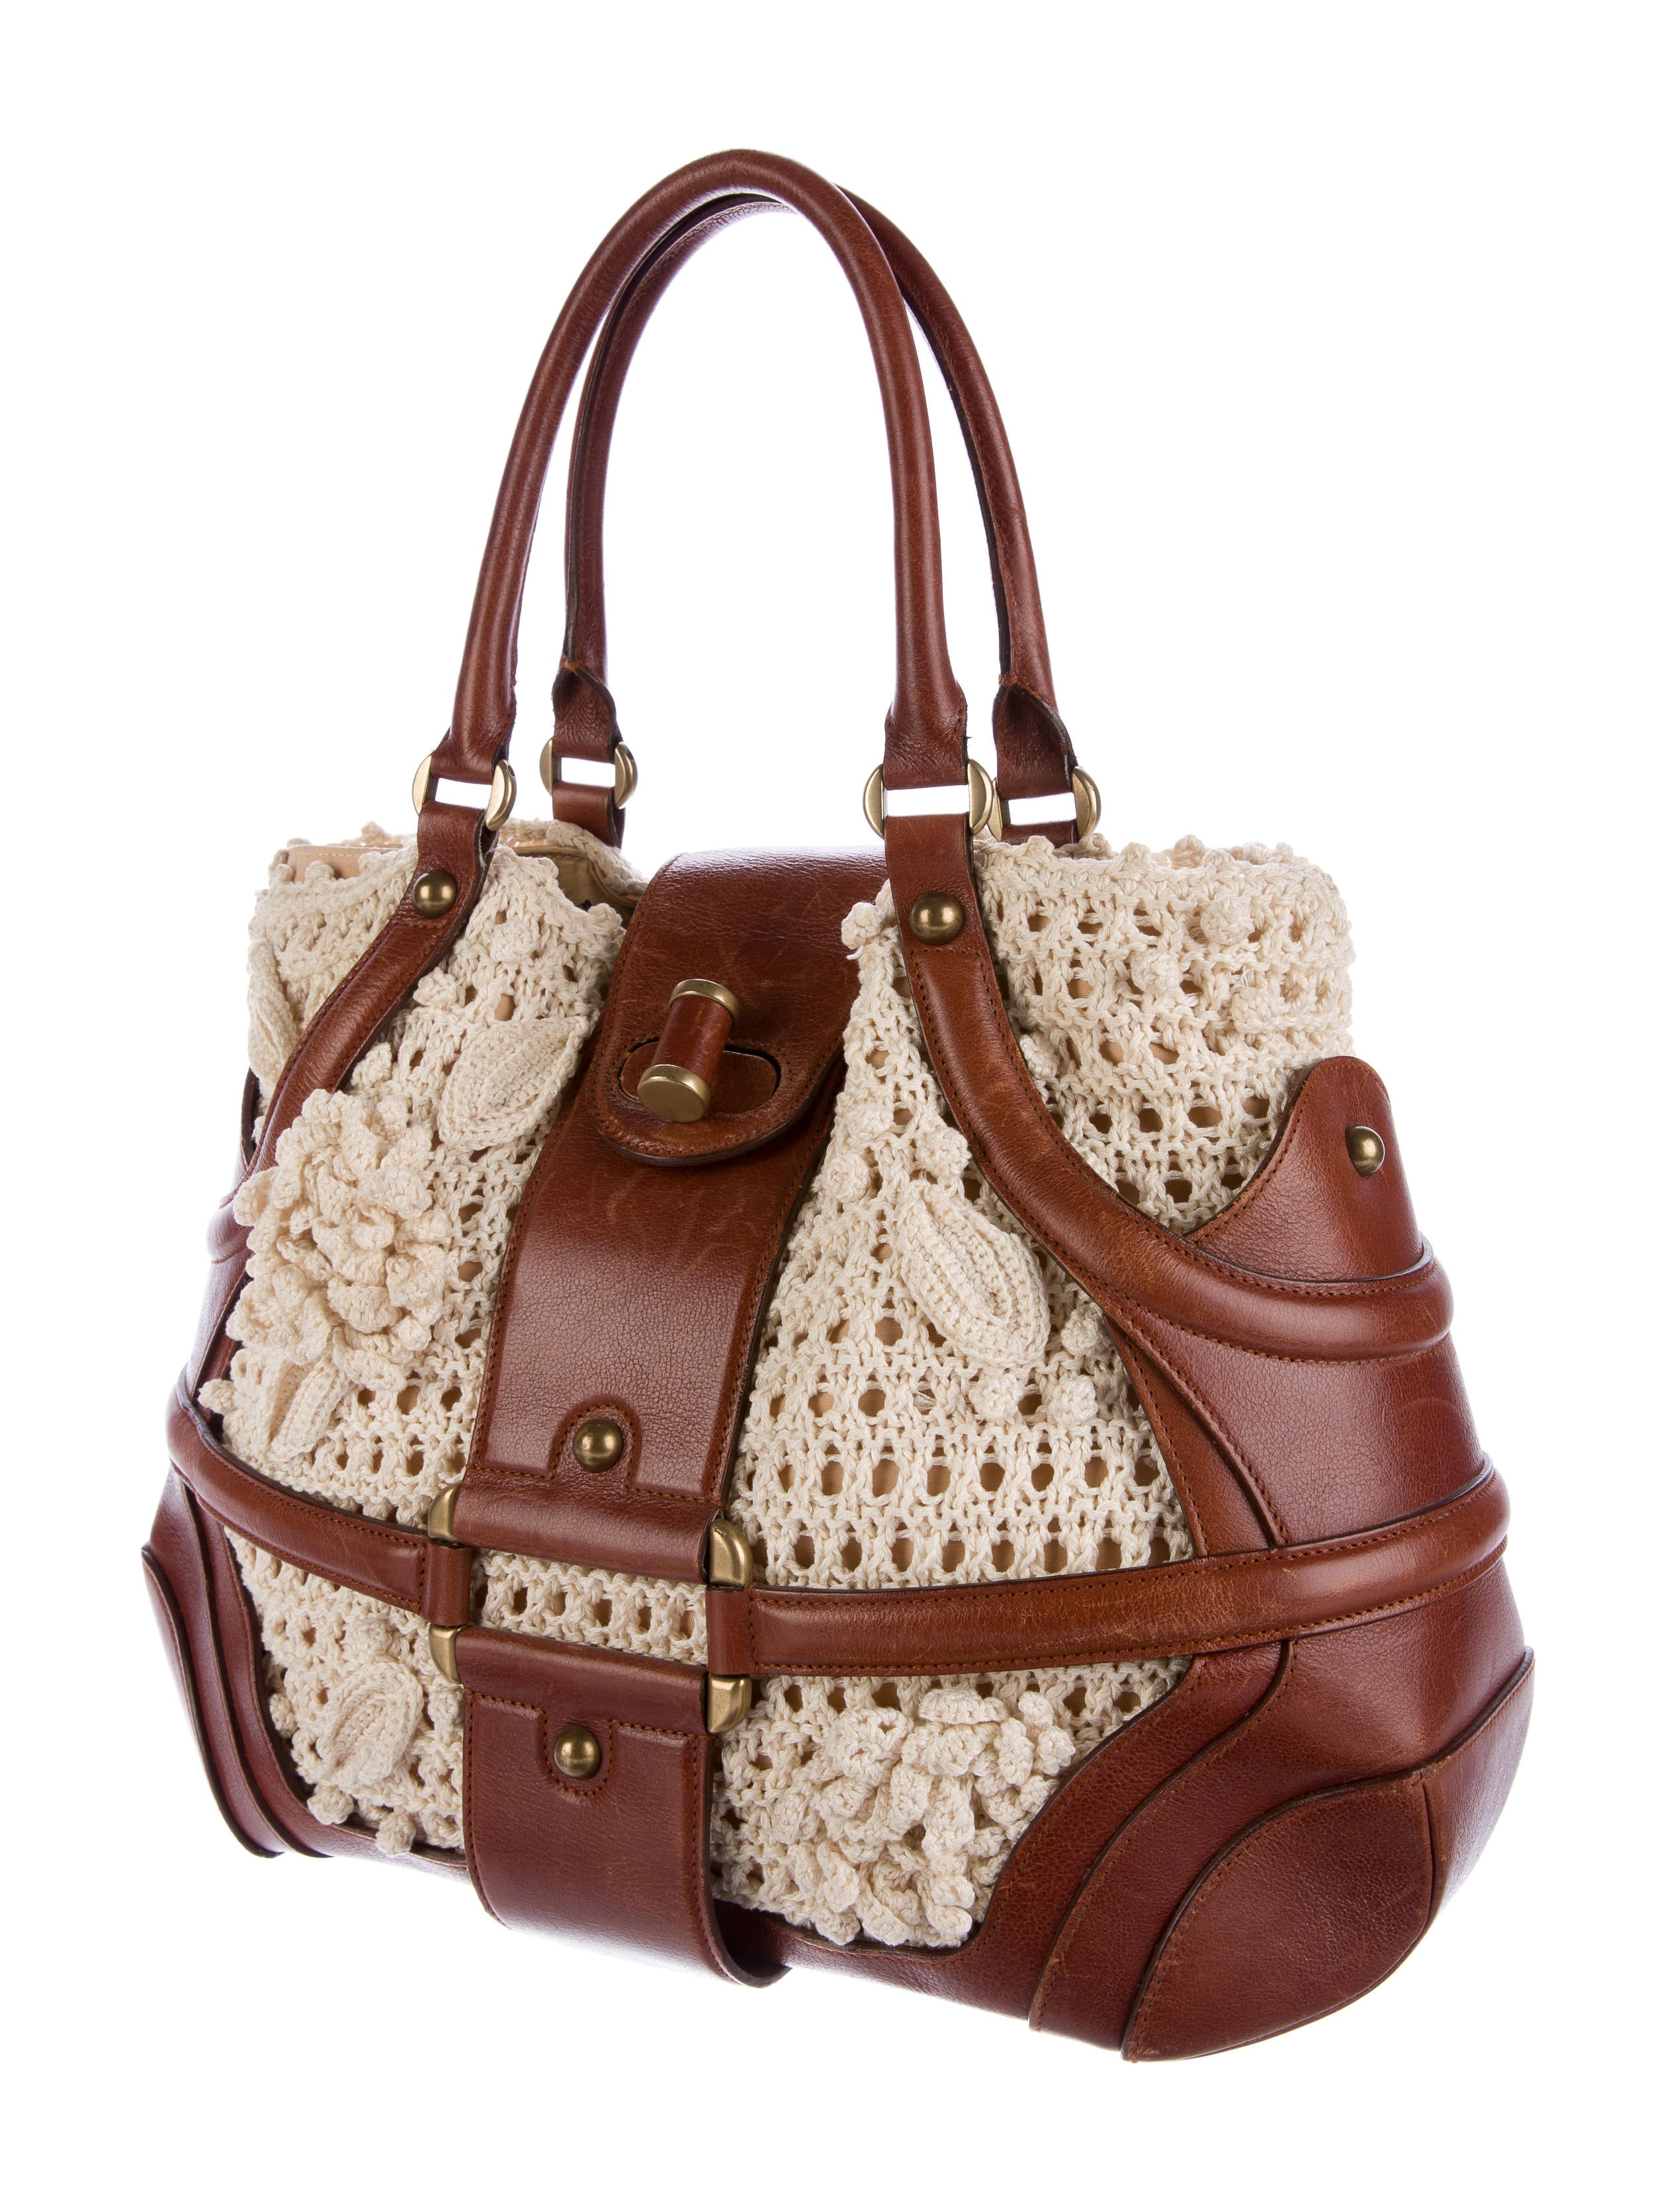 Alexander McQueen Crochet Handle Bag - Handbags - ALE37588 ...